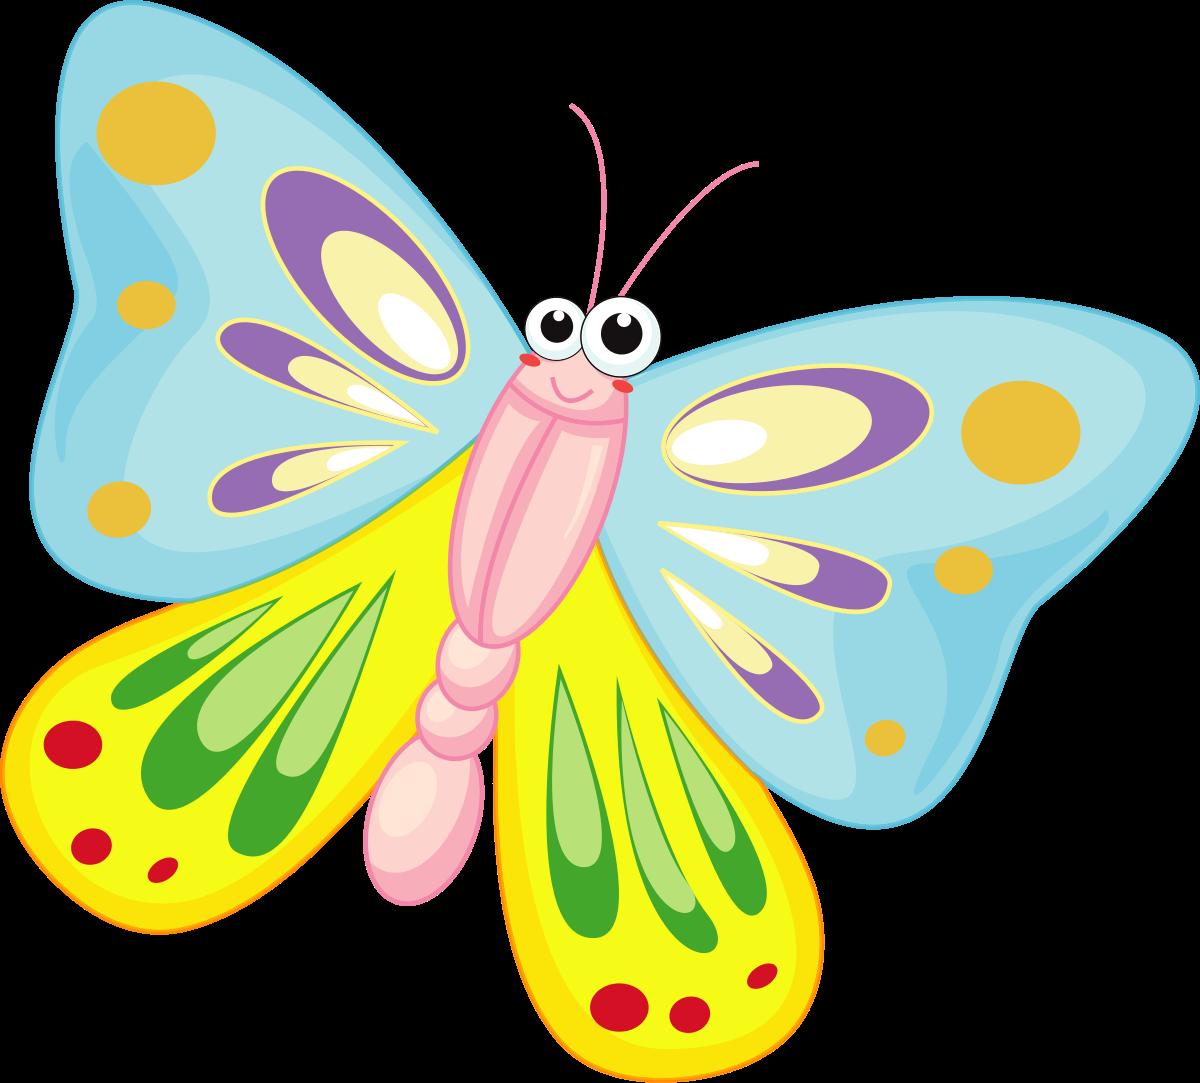 Clipart free butterfly, Clipart free butterfly Transparent.